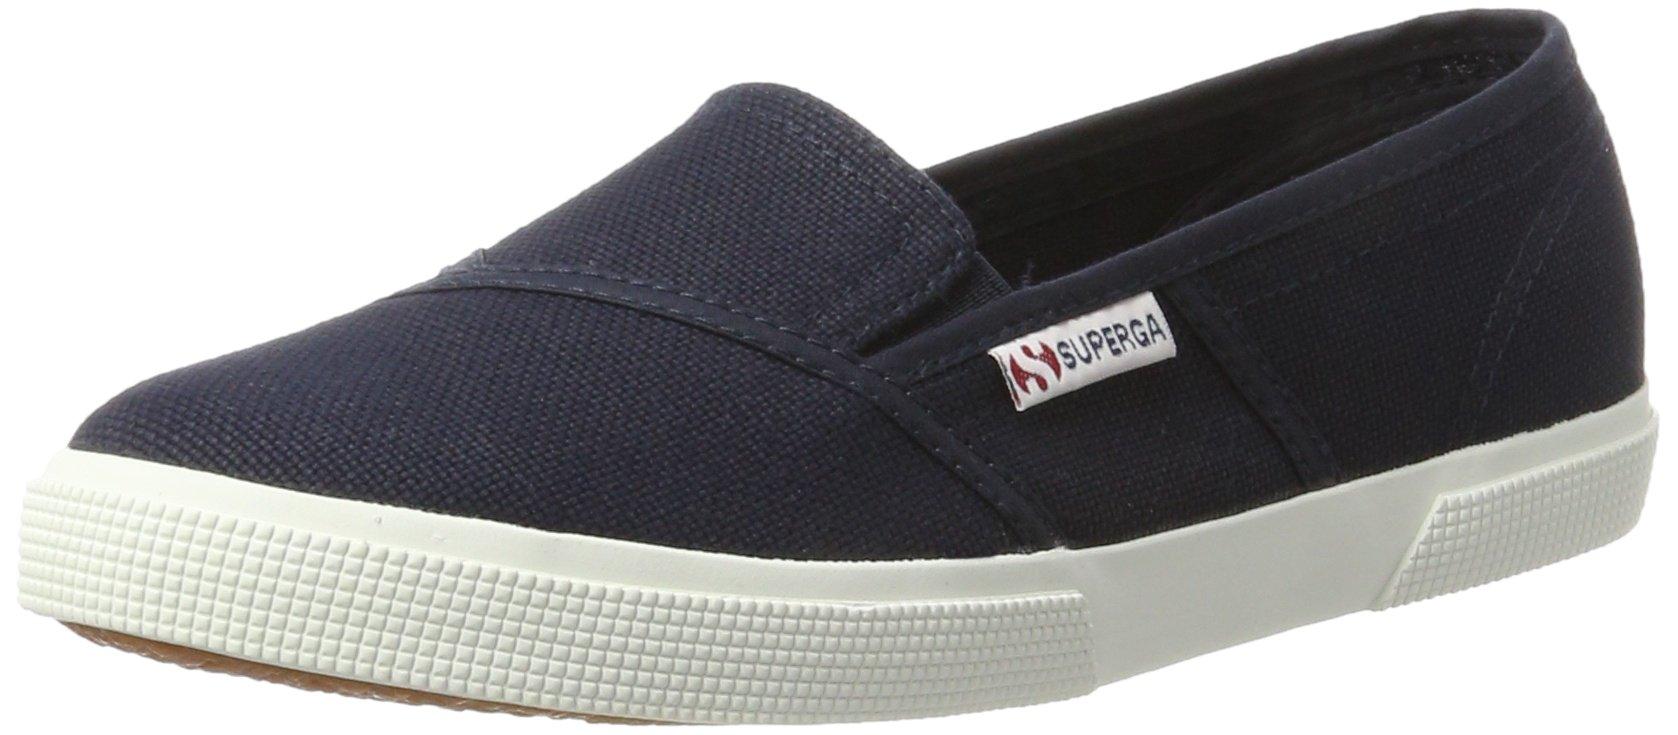 Superga Women's 2210 COTW Loafers- Buy